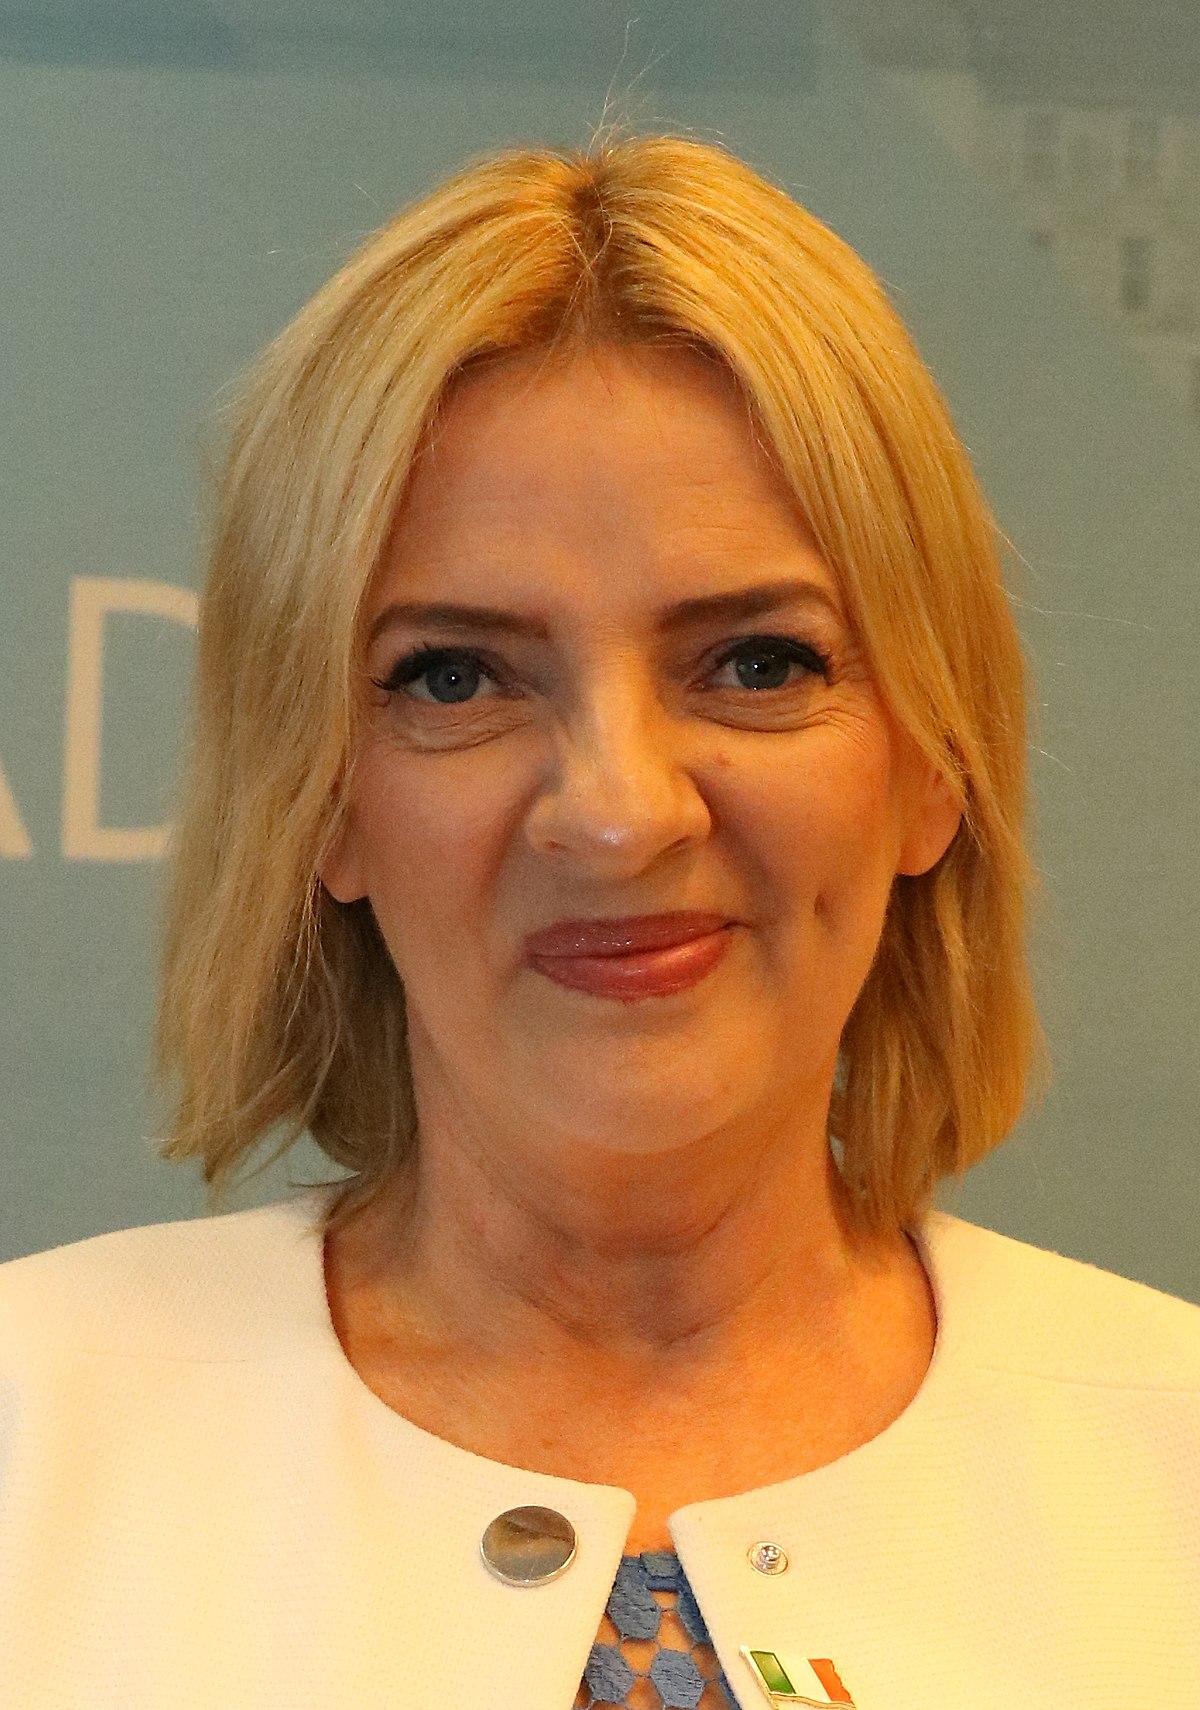 Liadh Ní Riada - Wikipedia